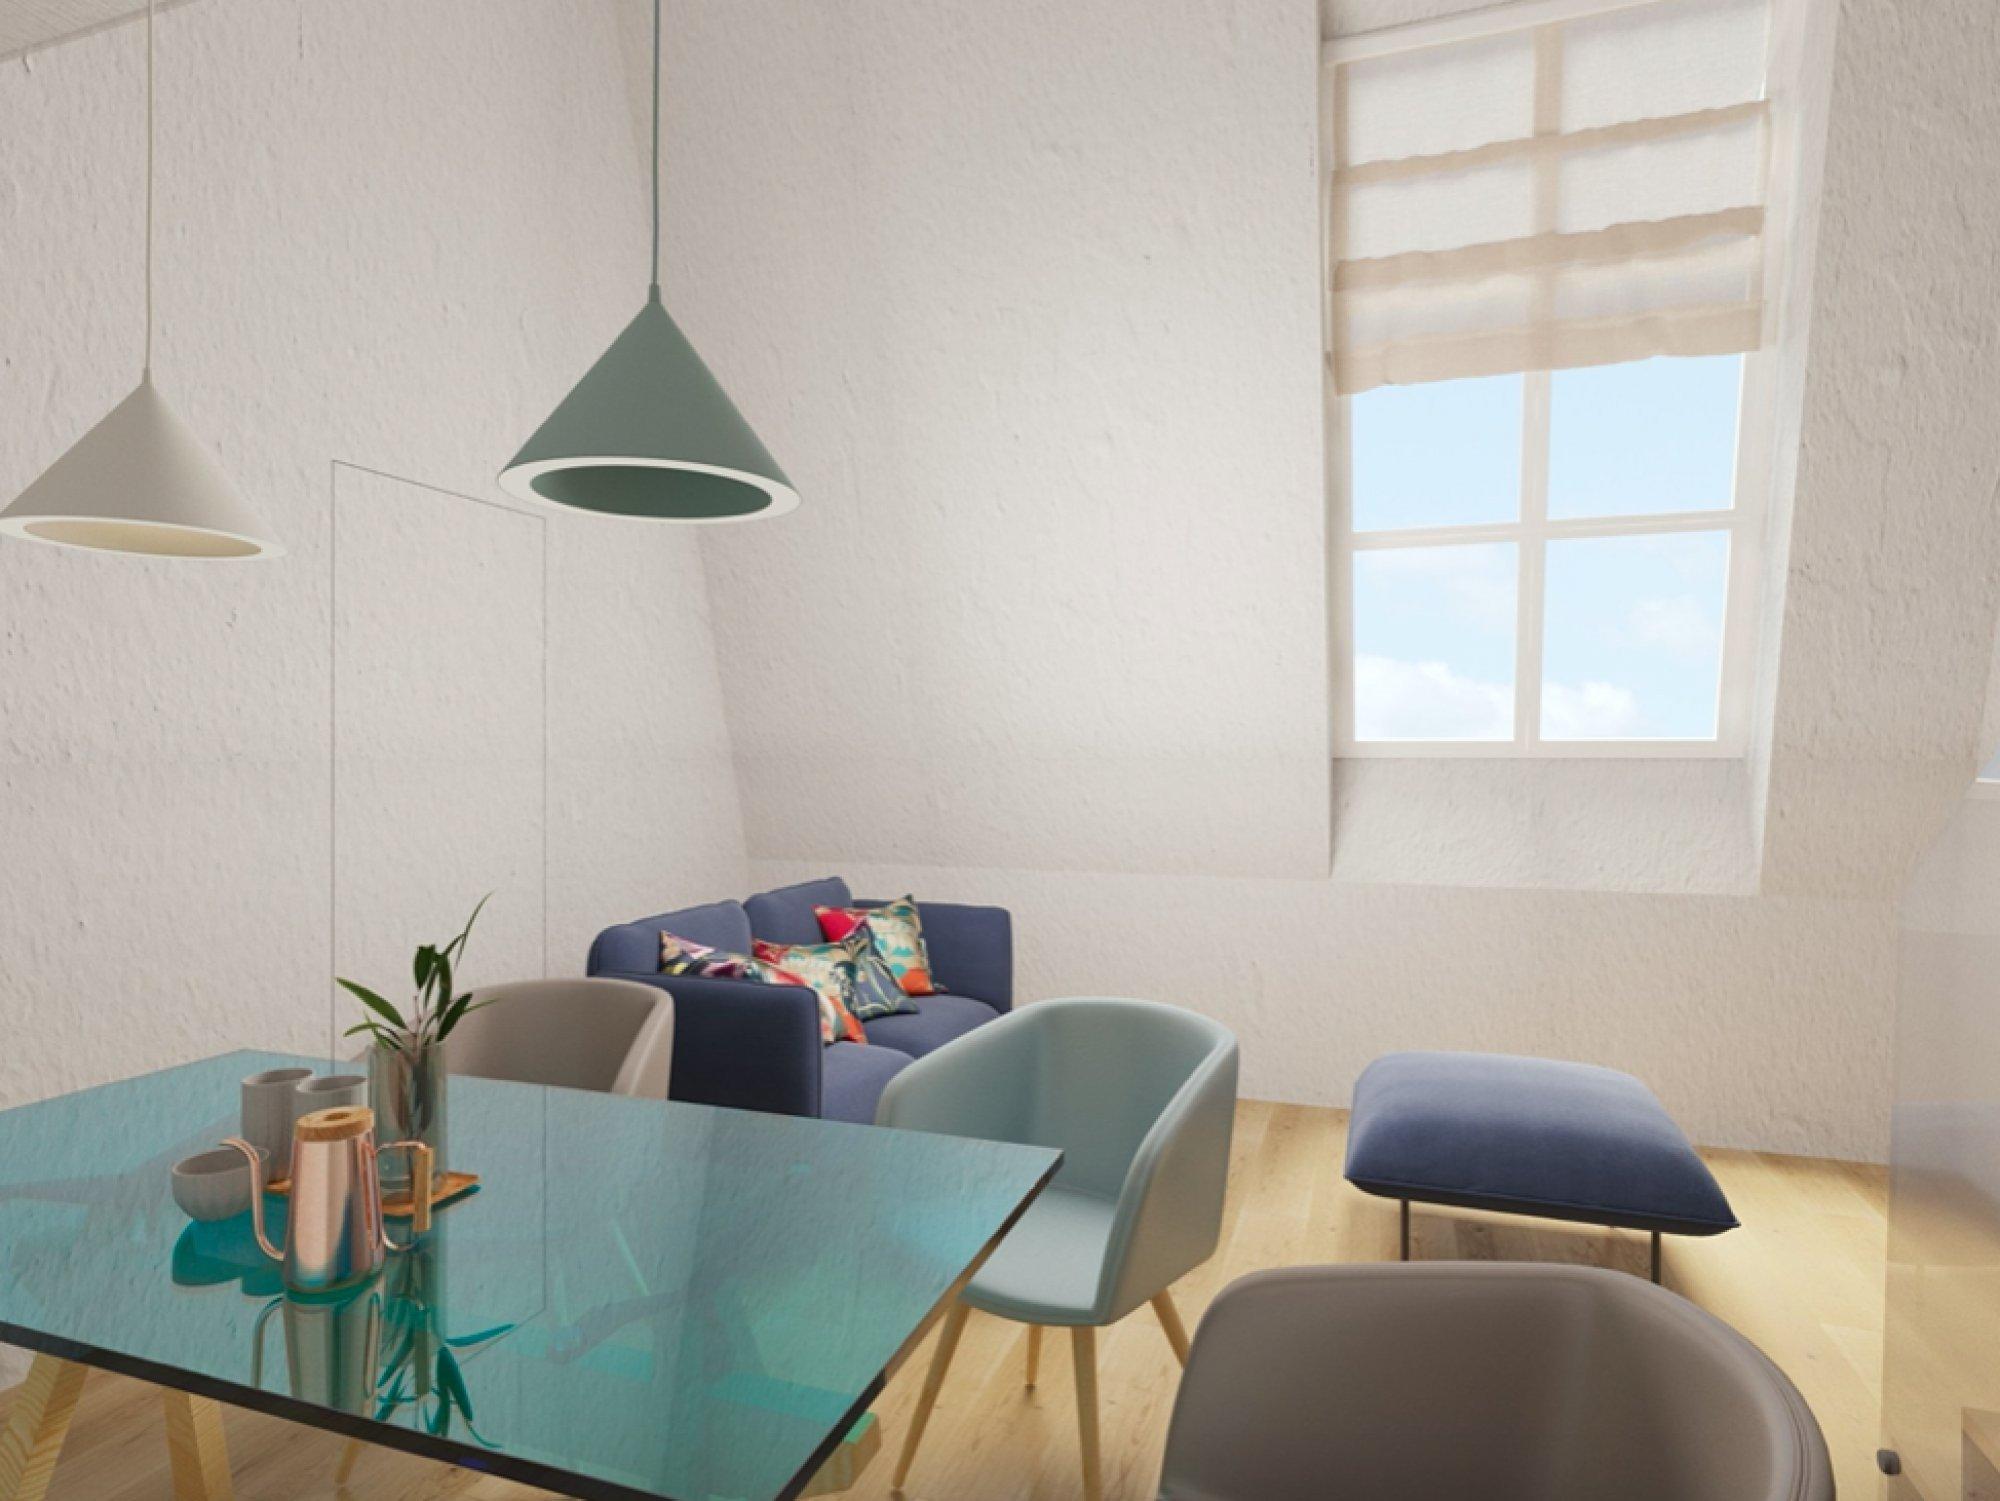 Půdní byt 2+kk, plocha 53 m², ulice Seifertova, Praha 3 - Žižkov | 1